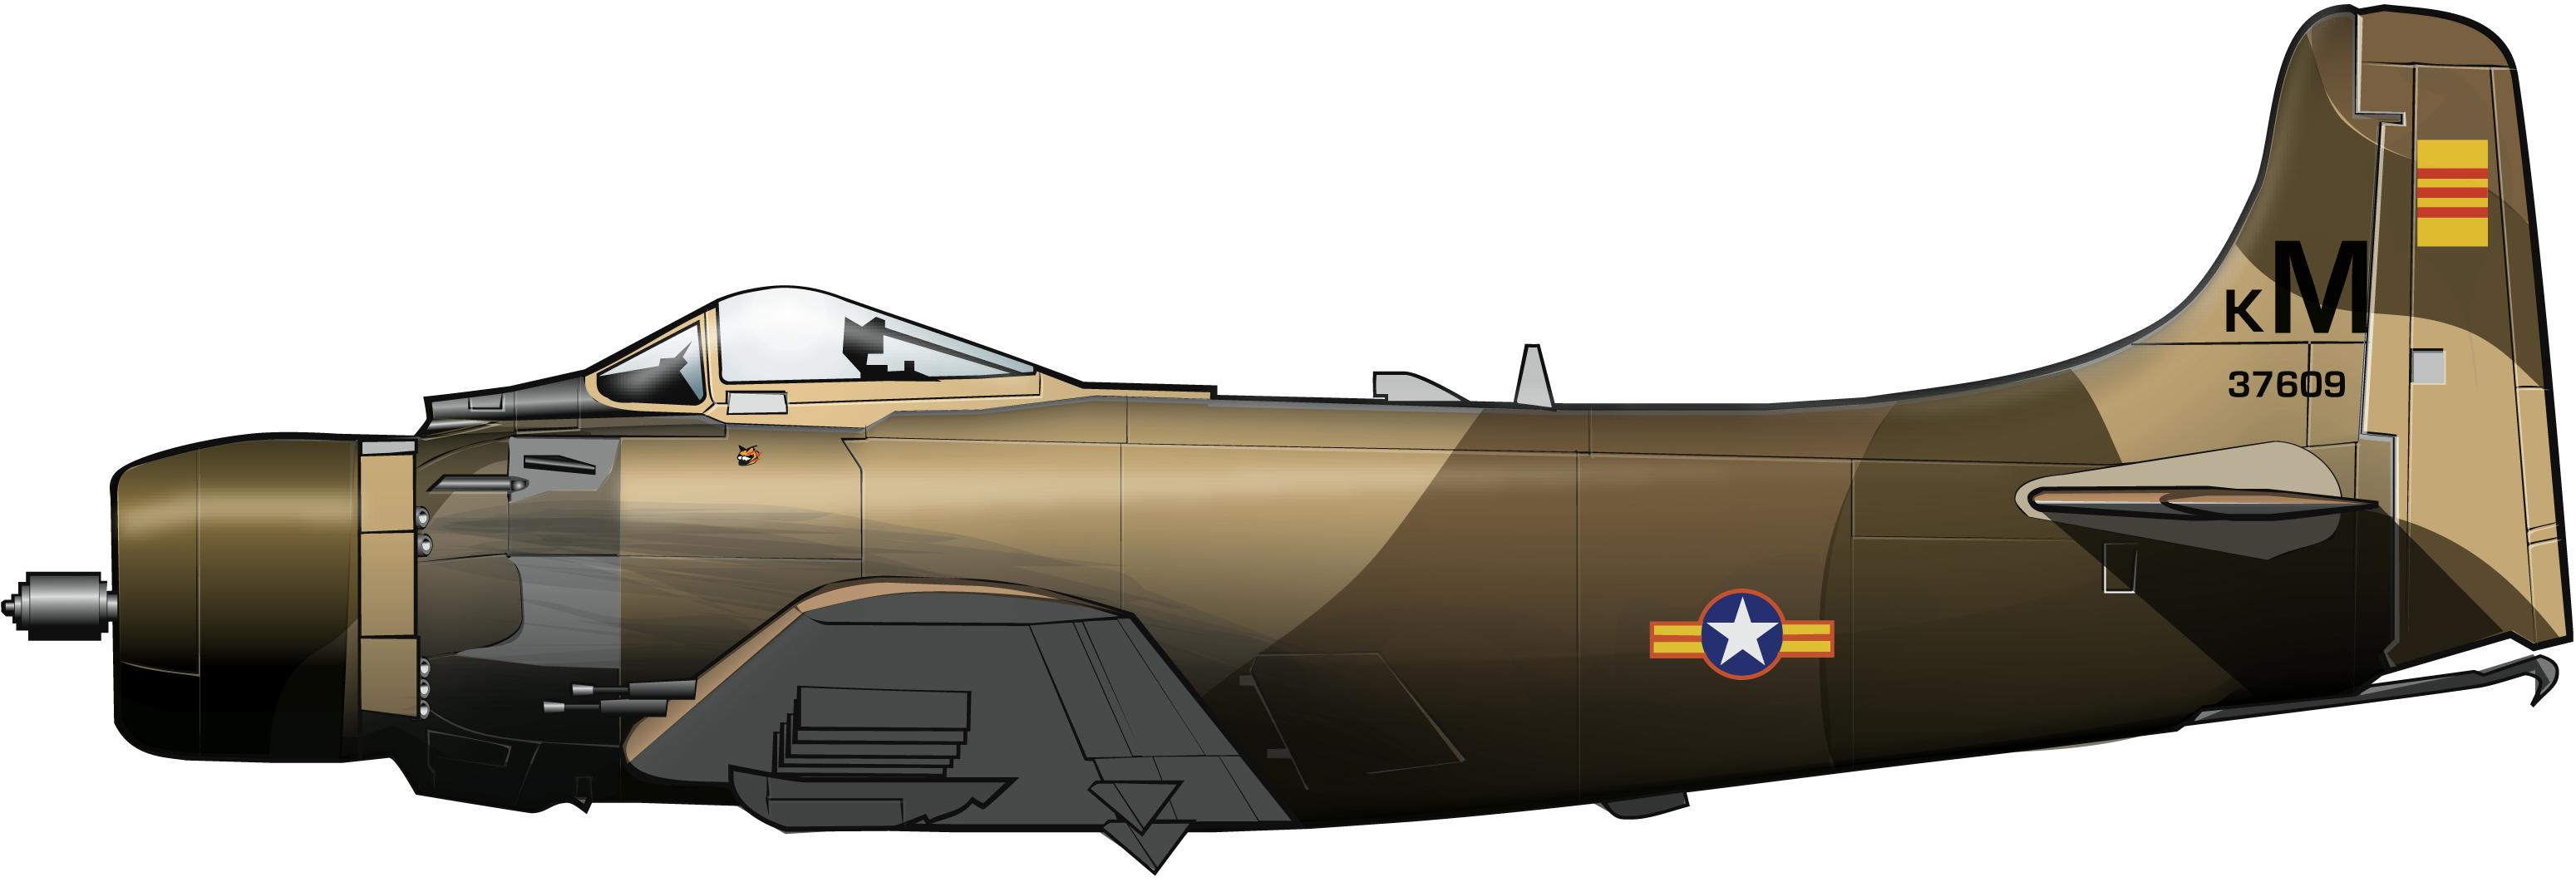 skyraidervnaf1972